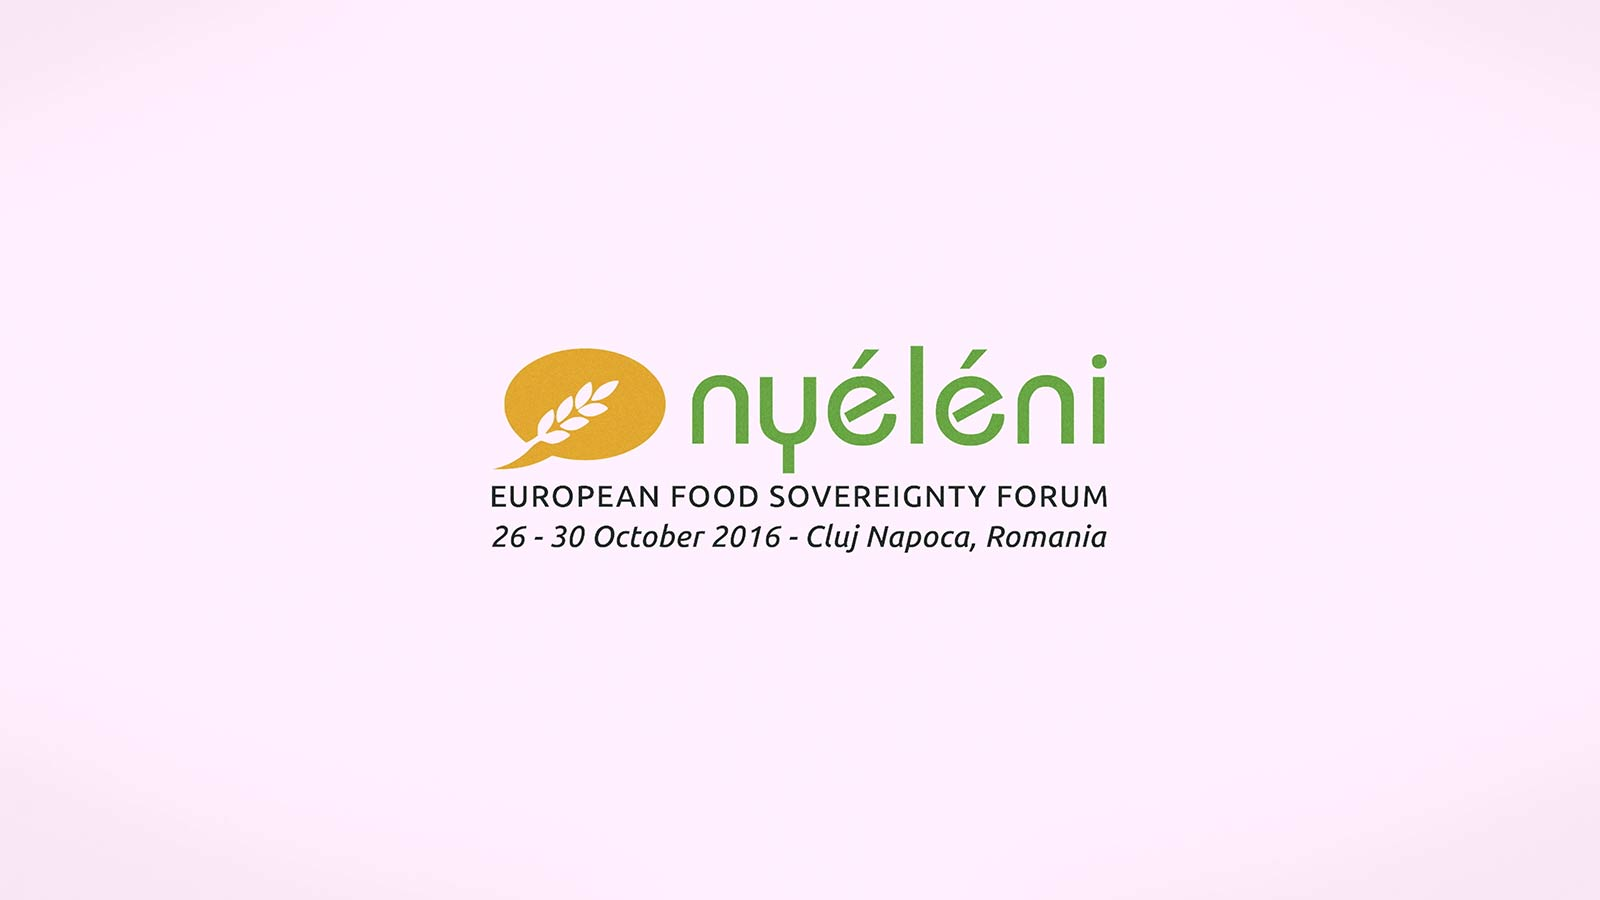 nyeleni-europe-forum-voor-voedselsoevereiniteit